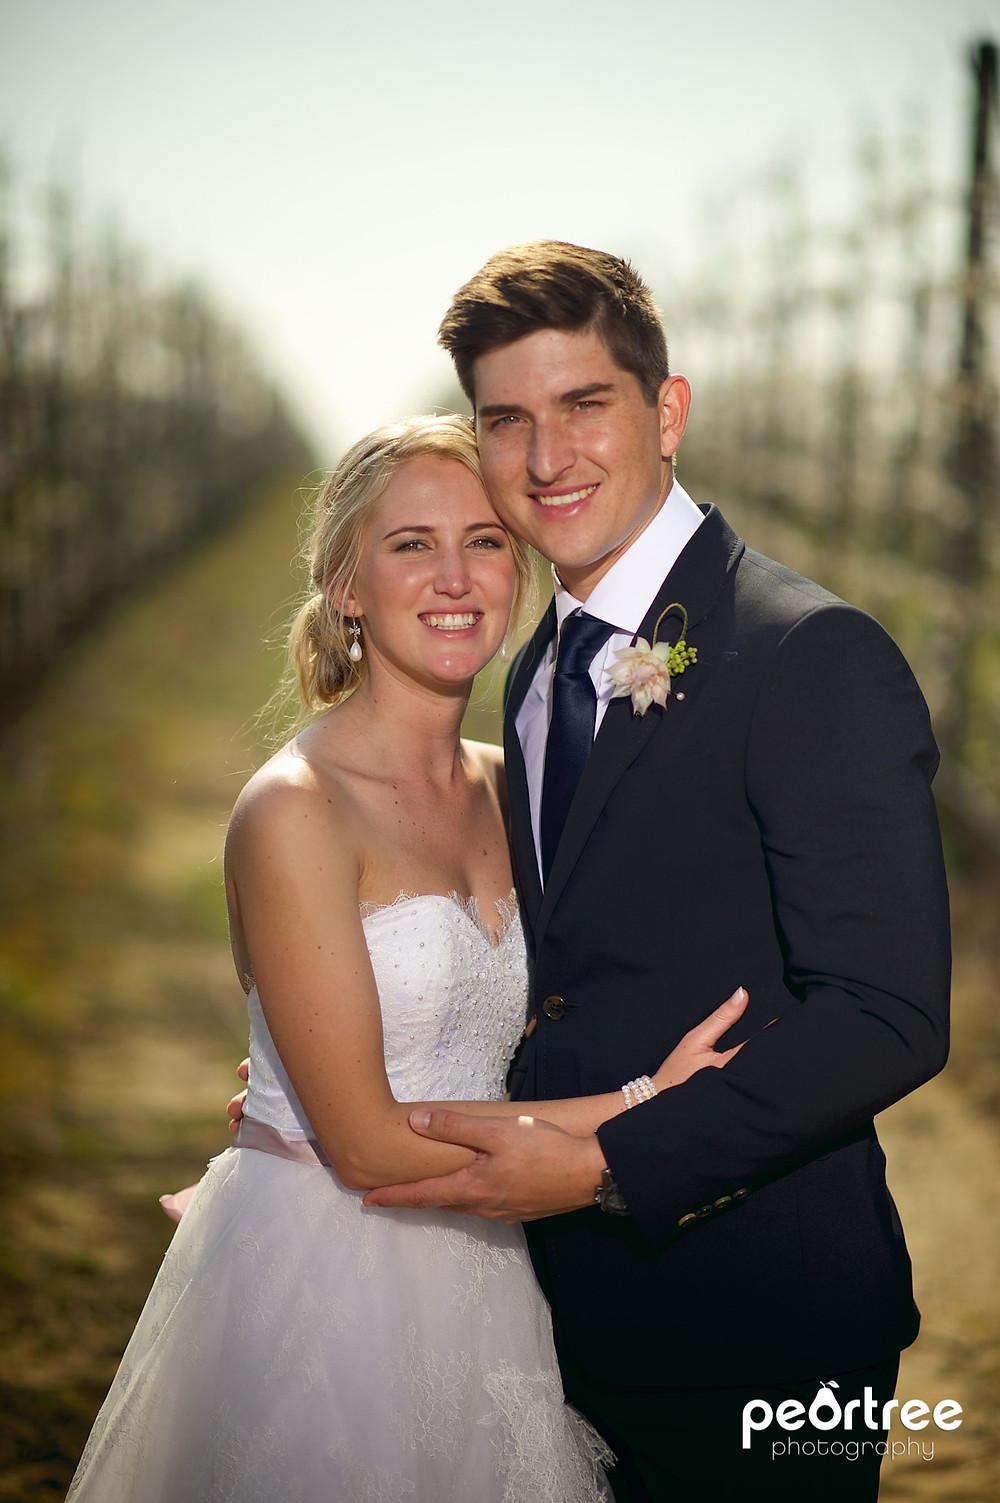 Landtscap Wedding Photos | WP & Wanneke